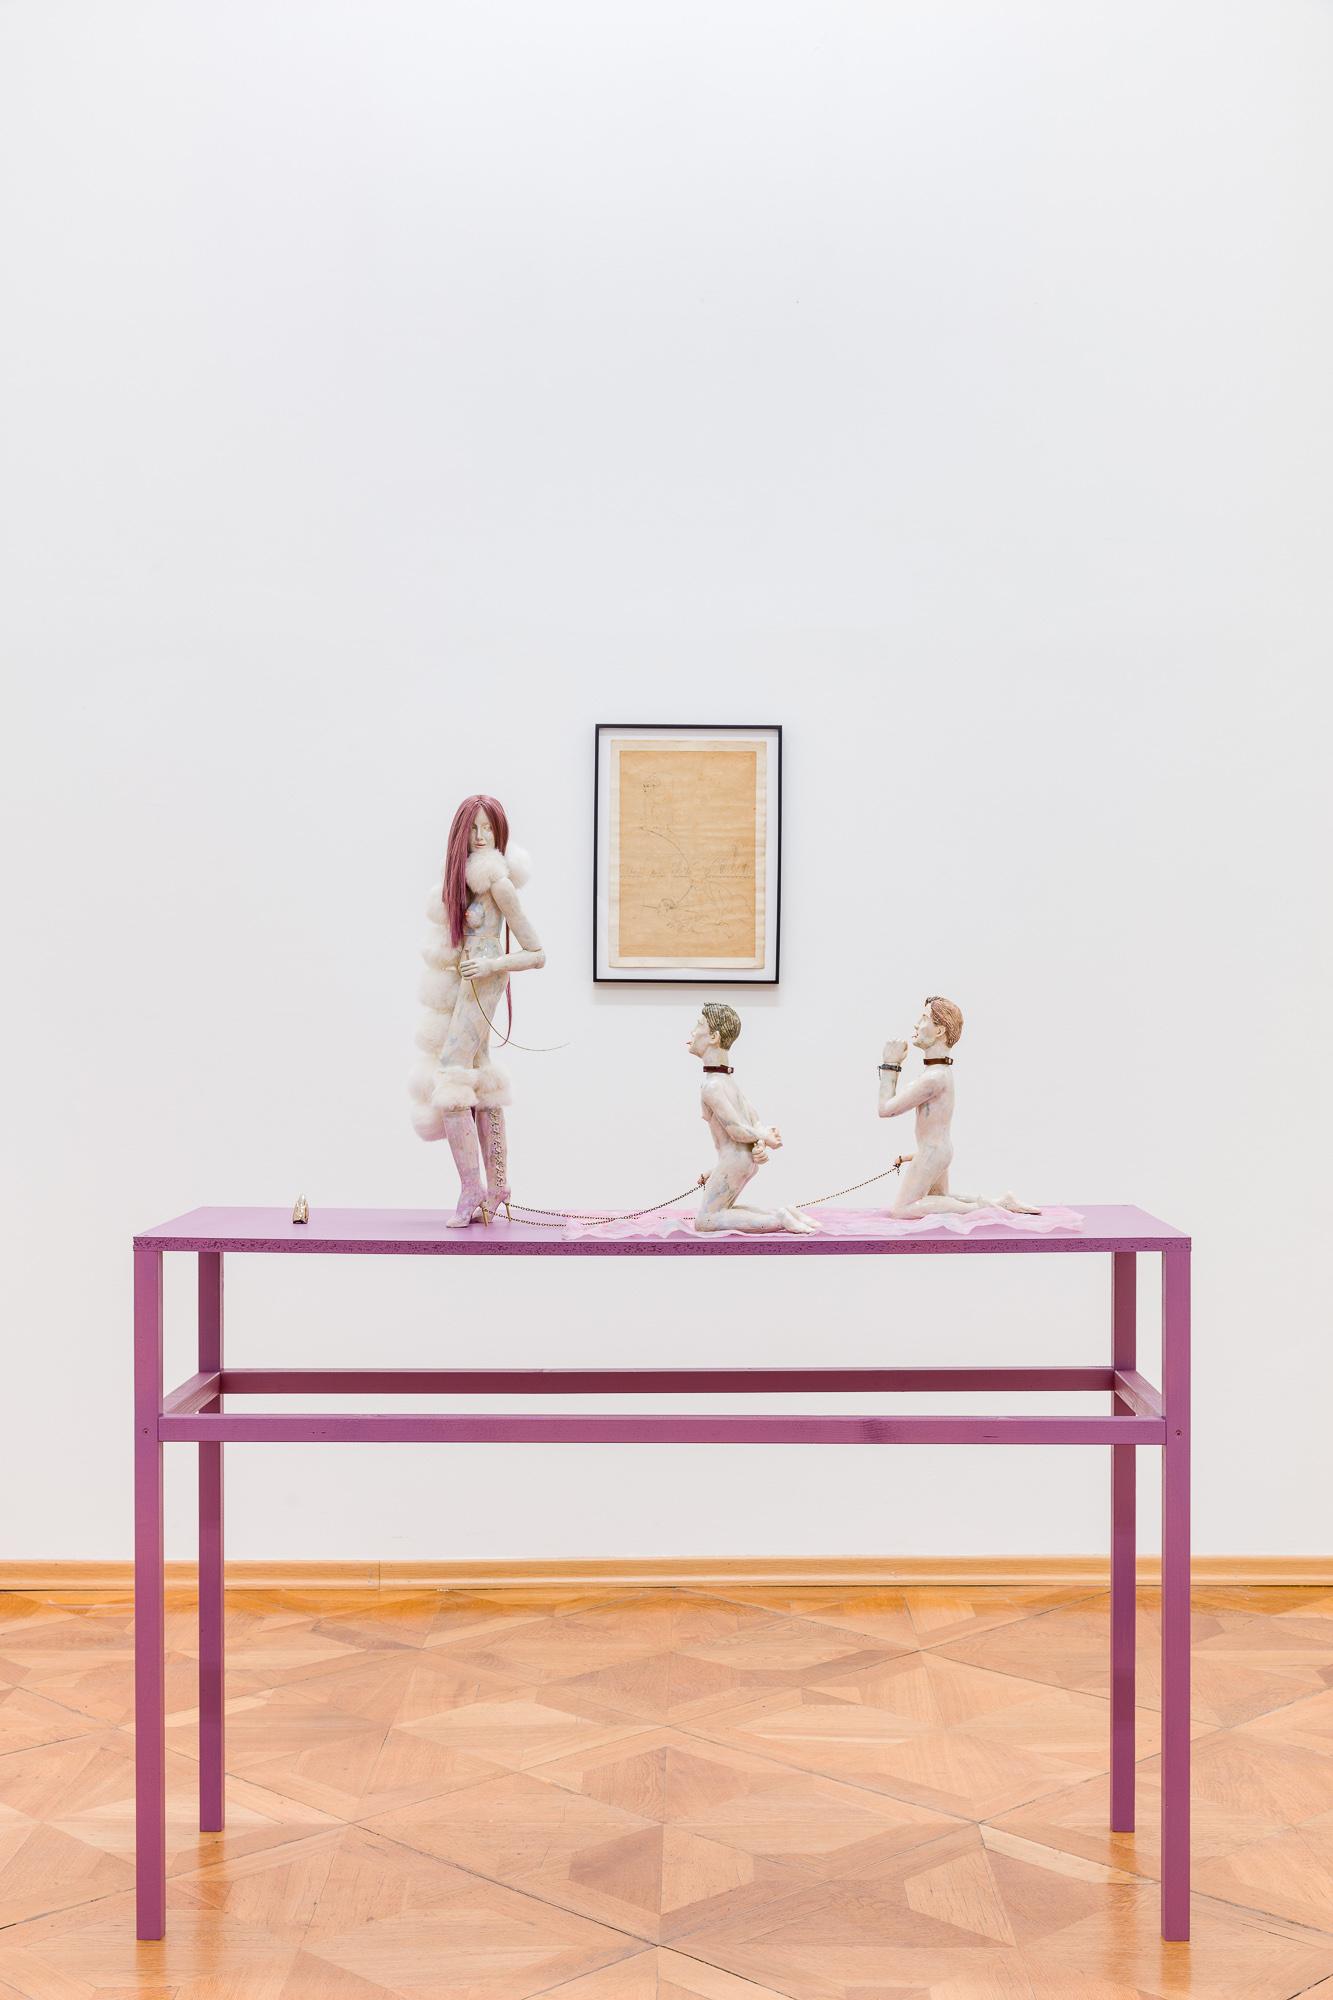 2018_11_22_Zoe Barcza & Soshiro Matsubara at Croy Nielsen by kunstdokumentationcom_002_web.jpg